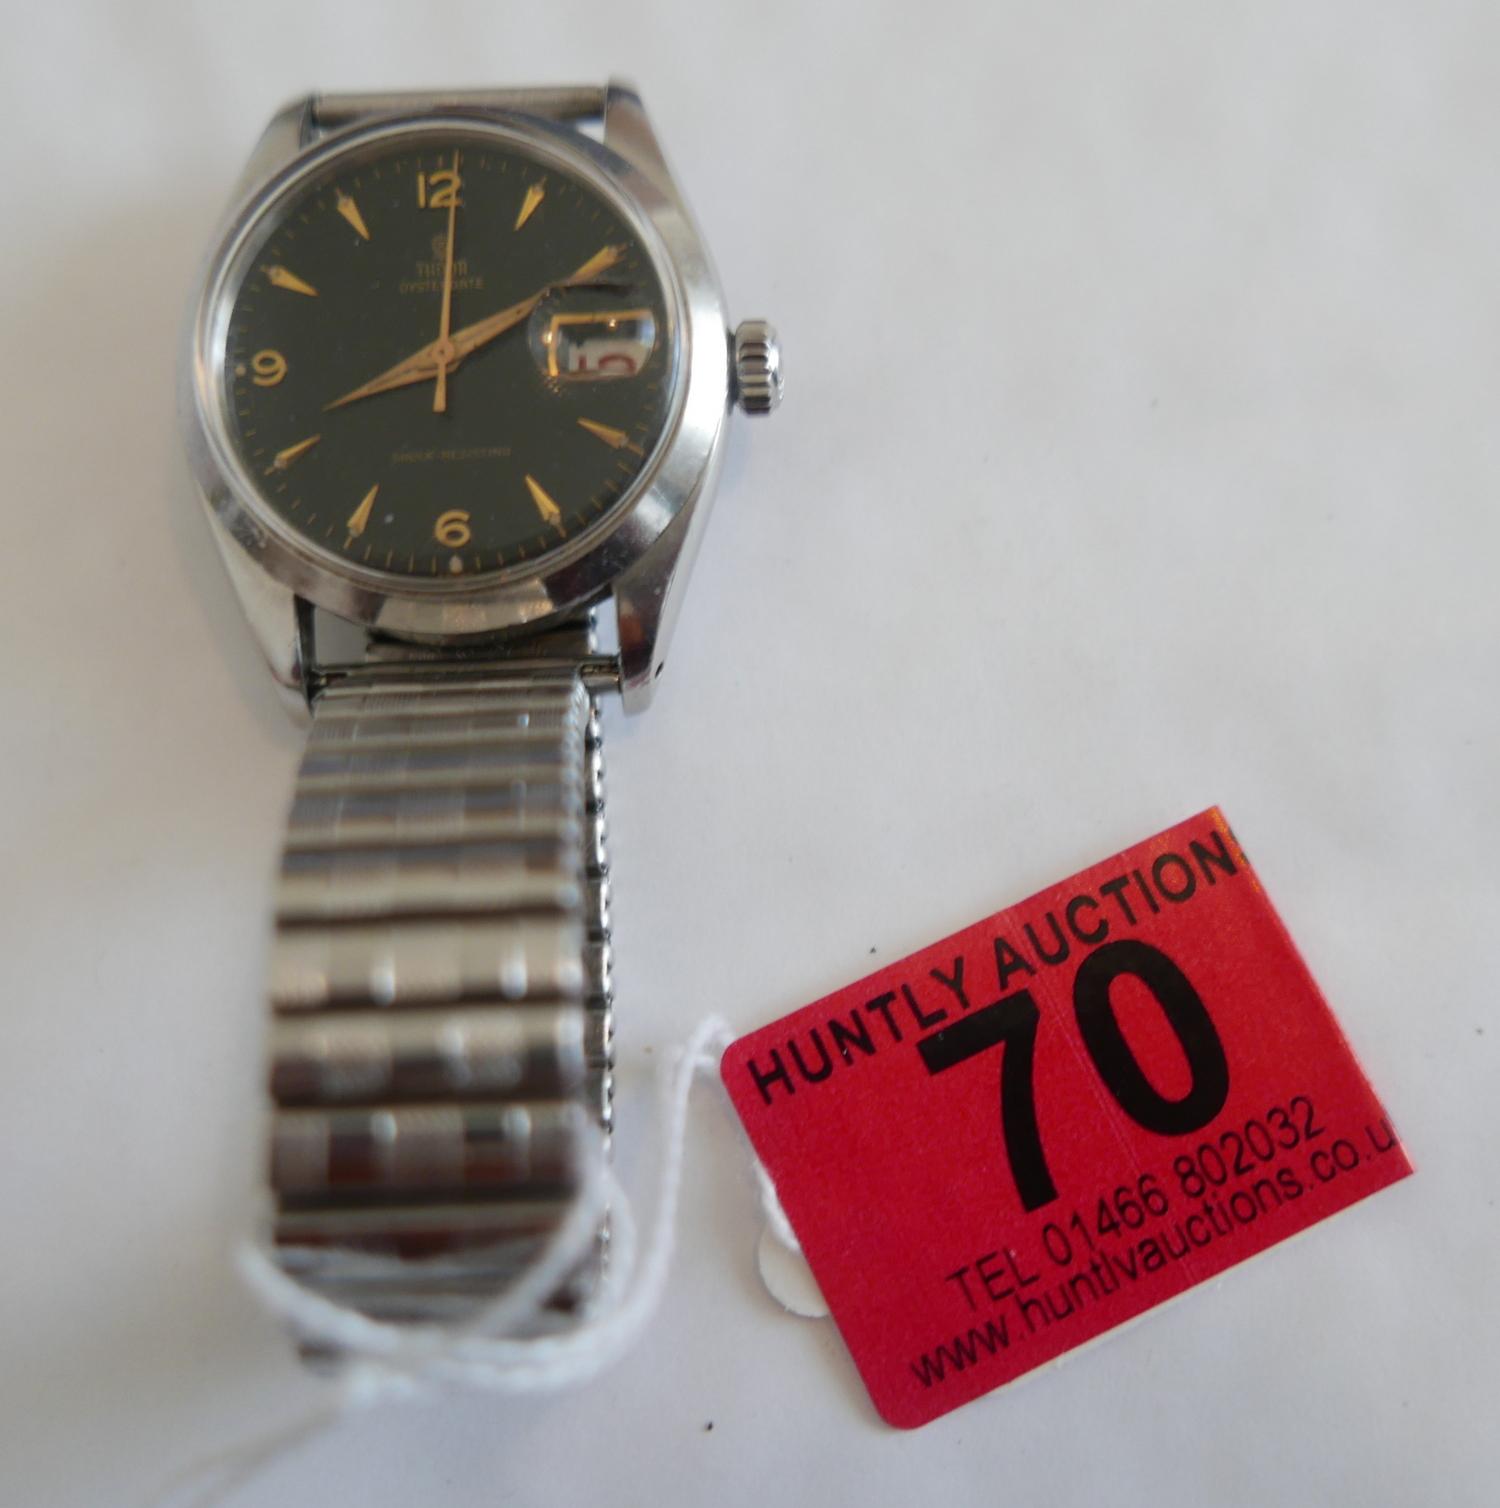 Lot 70 - Rolex Tudor Oysterdate Date - black dial 266137 - 7939 case numbers.